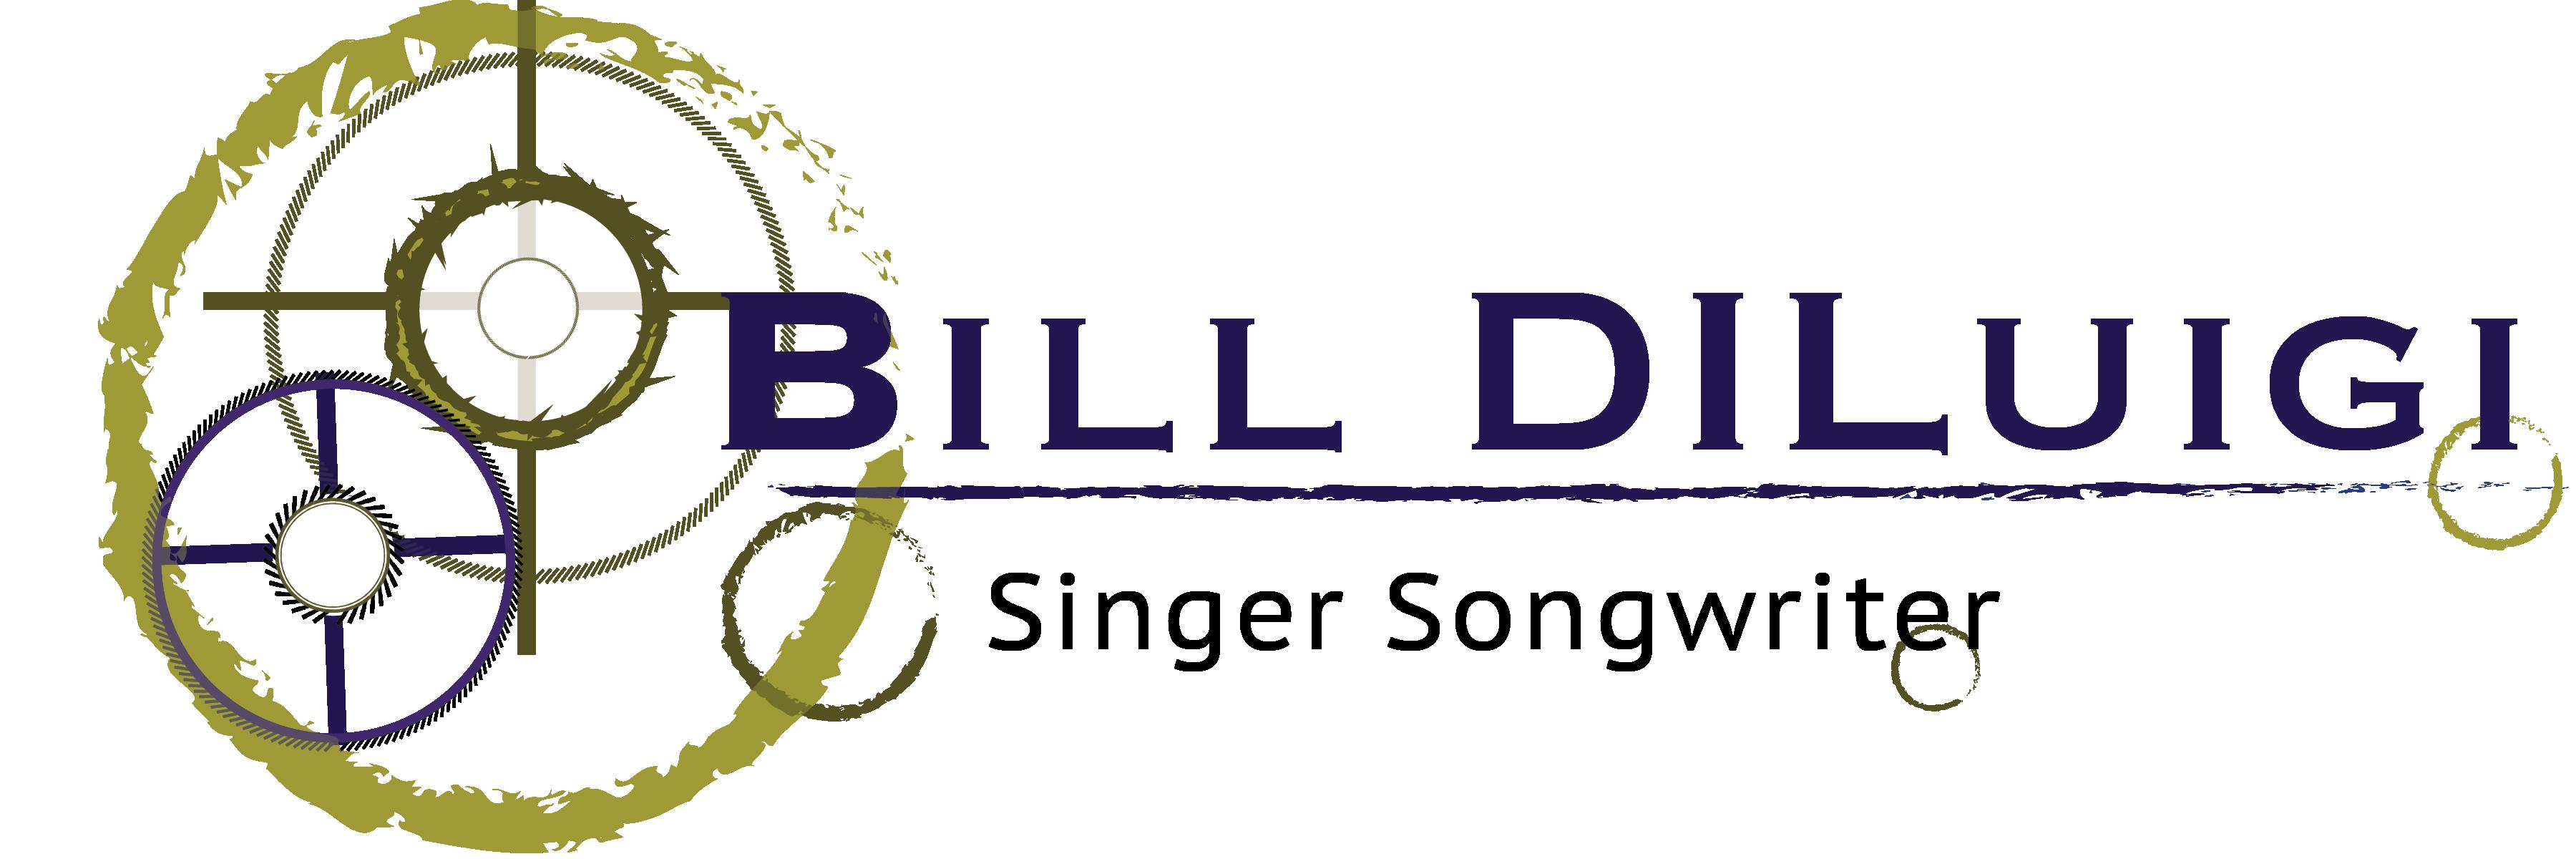 Bill DiLuigi